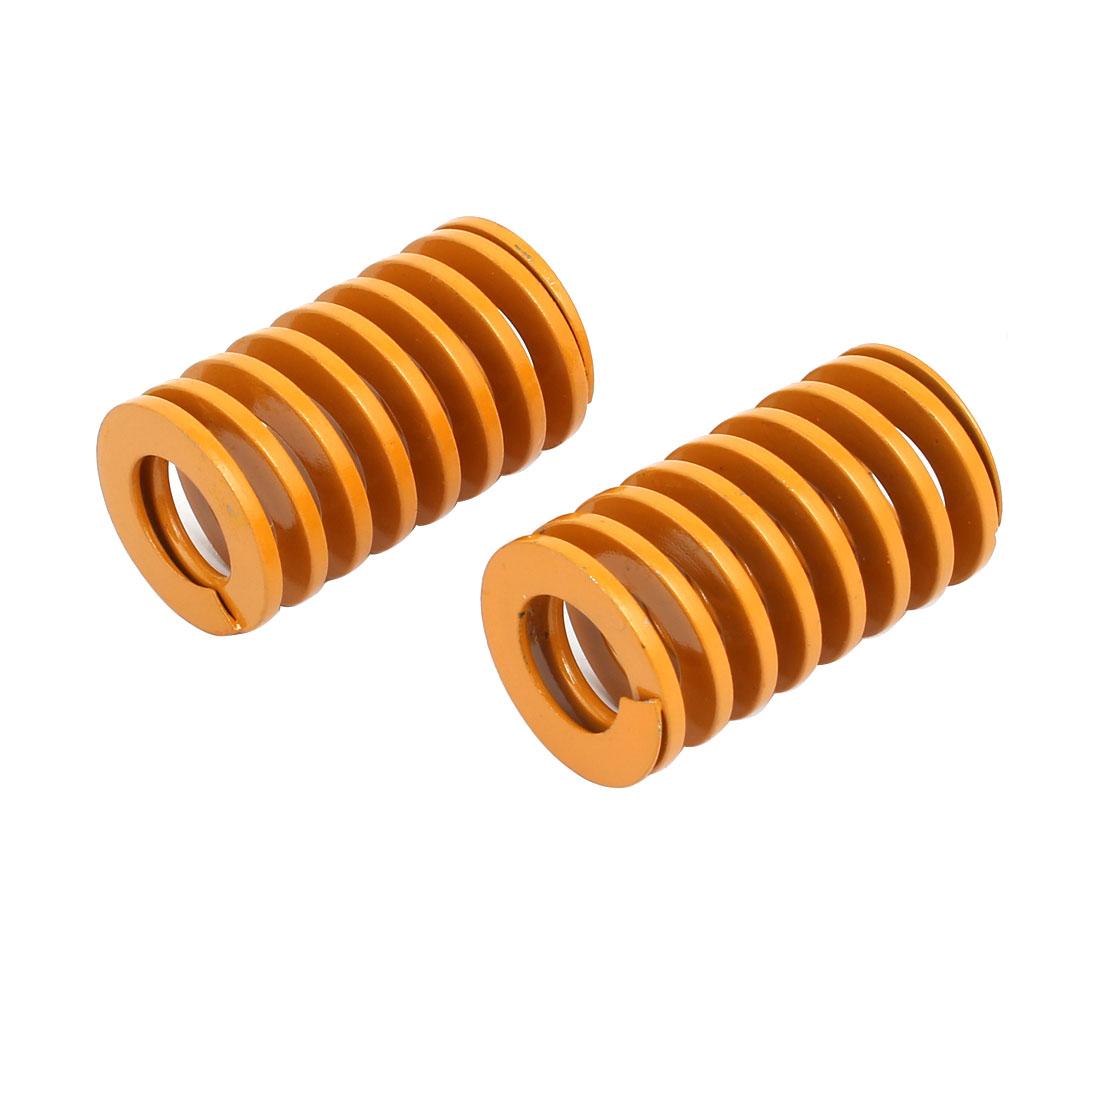 30mm x 50mm Mechanical Metal Spiral Compression Coil Die Spring Mould 2pcs